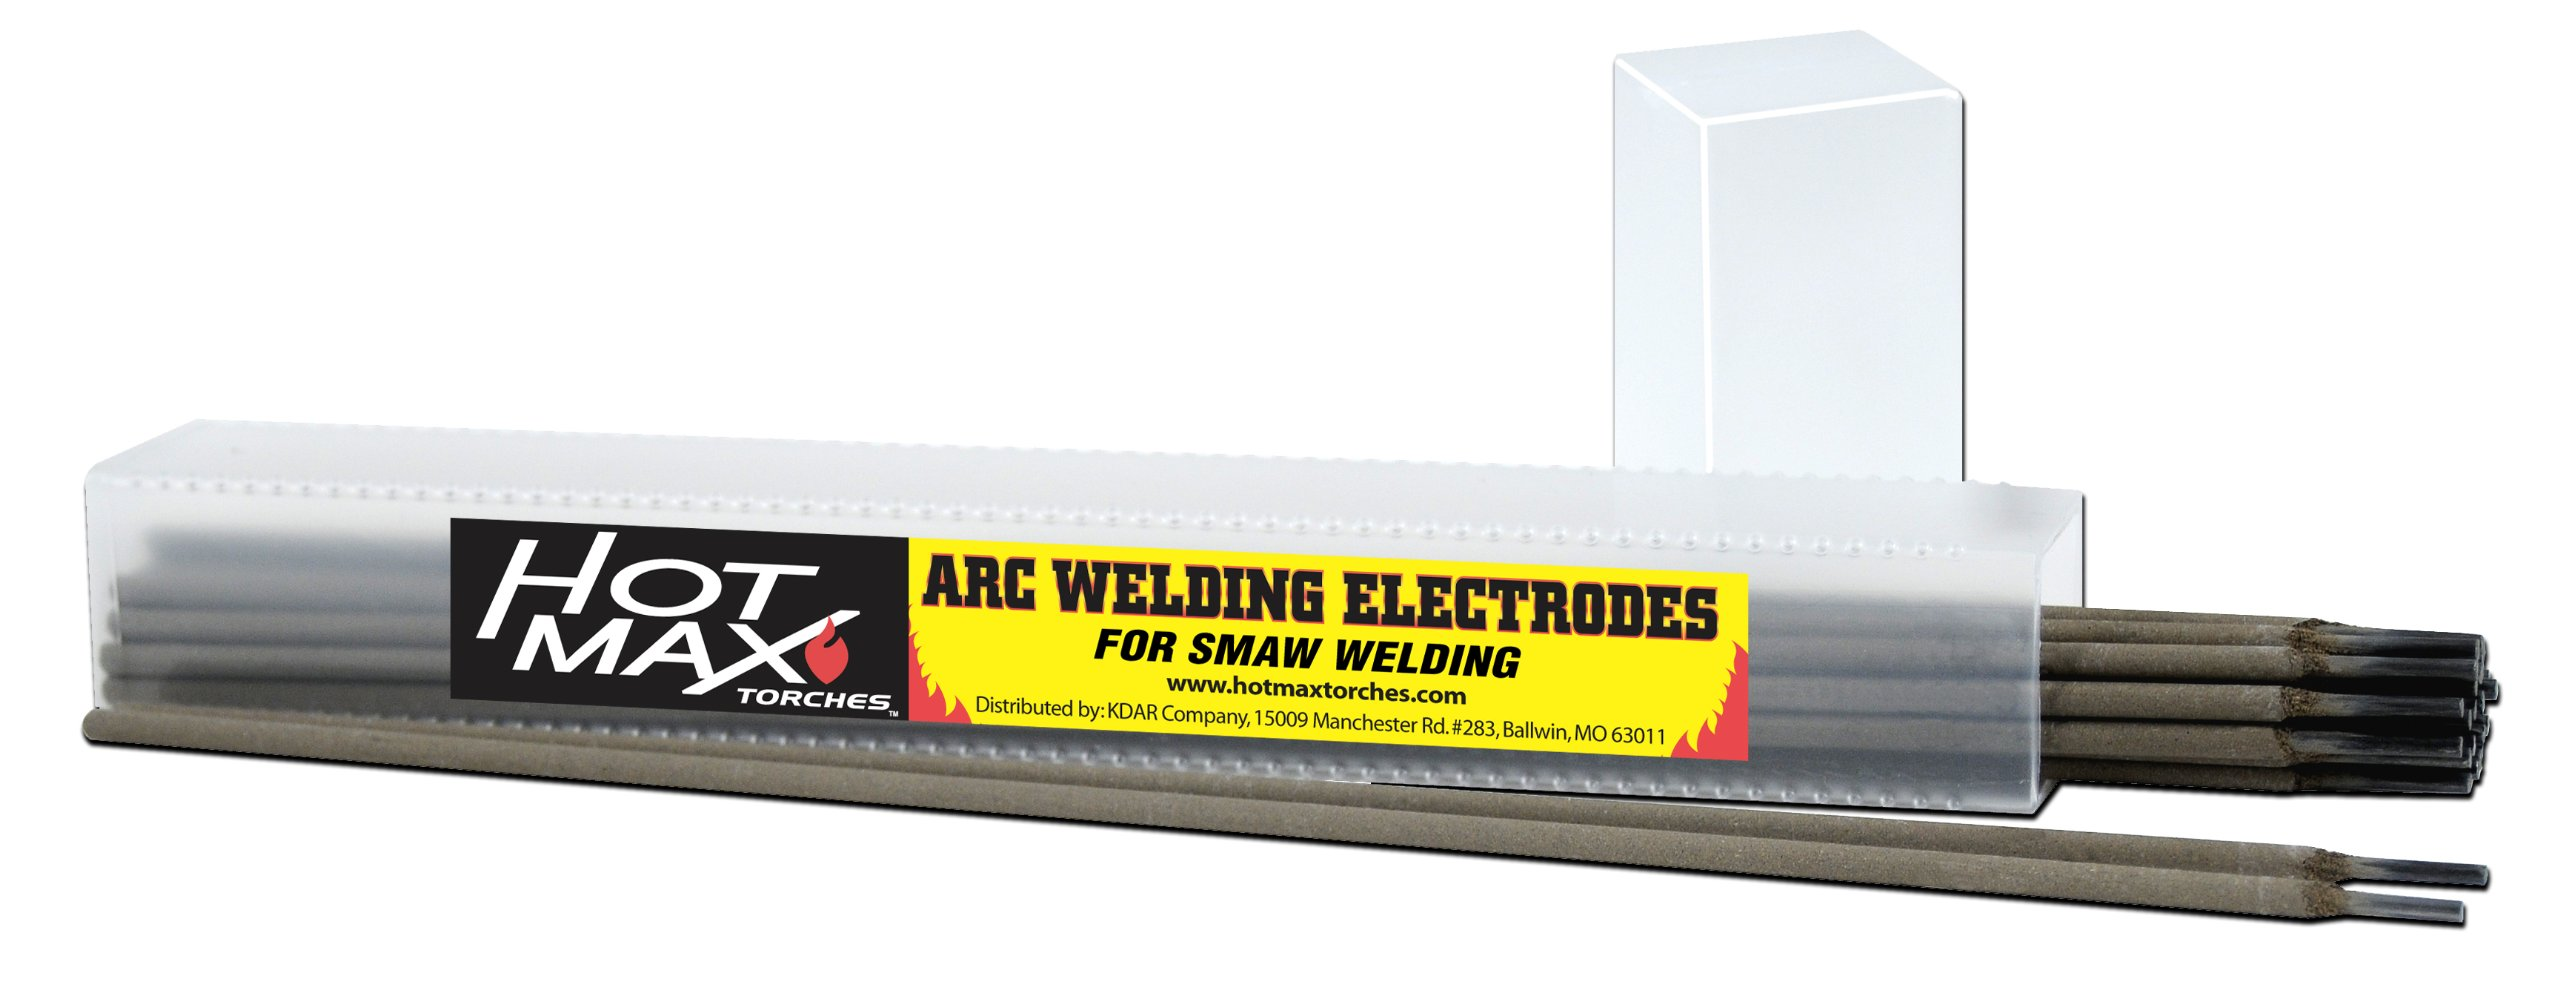 Hot Max 23076 1/8-Inch E4043 Aluminum Arc Welding Electrodes, 1#